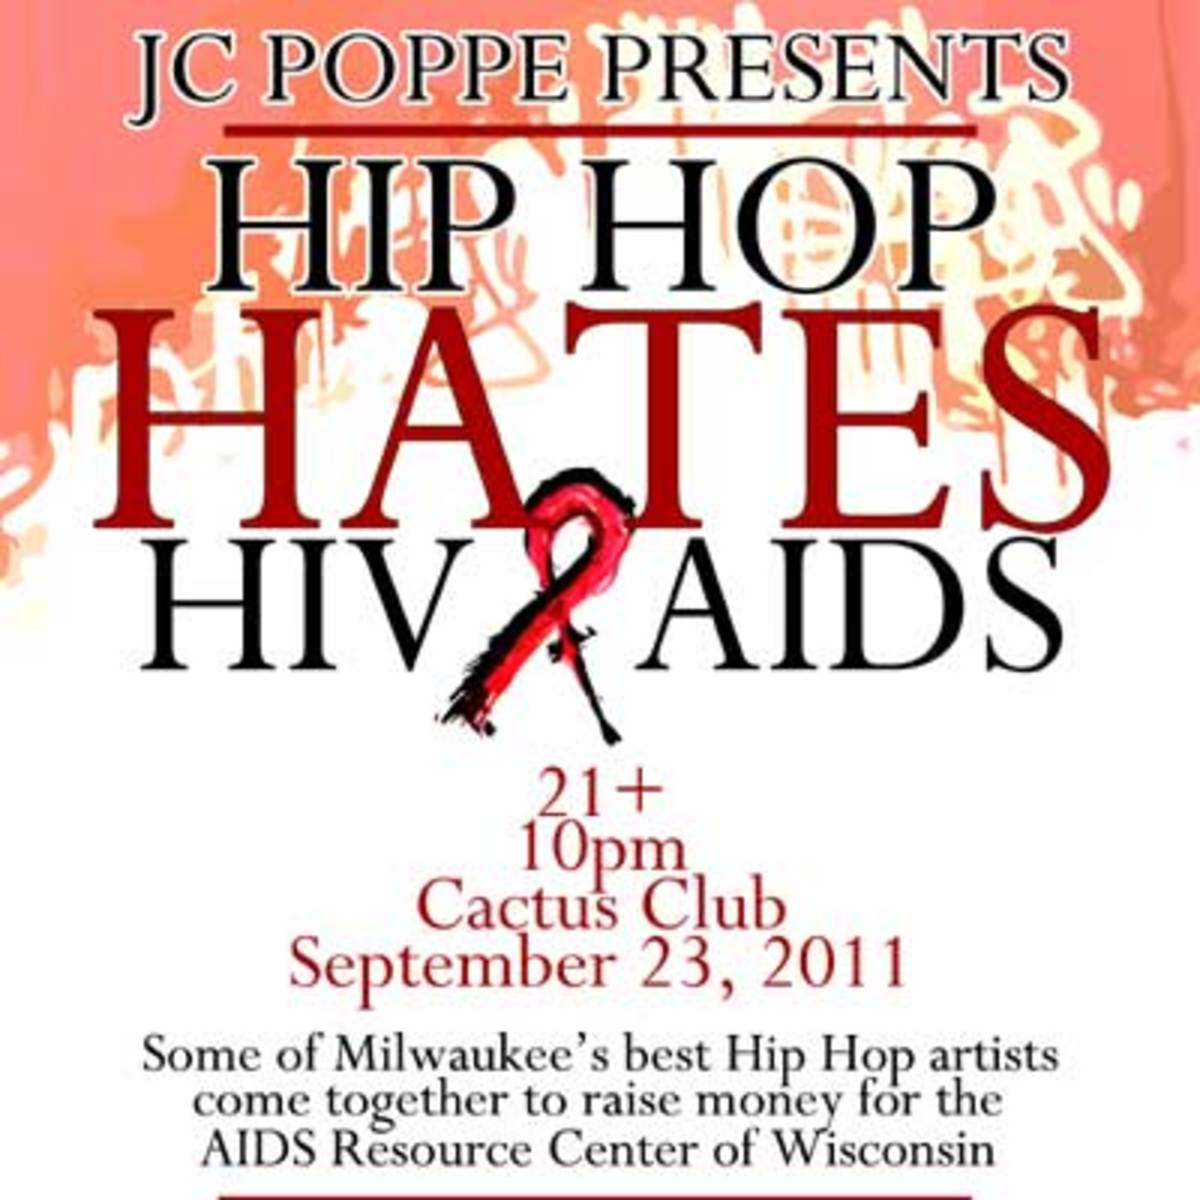 hiphophatesaids.jpg